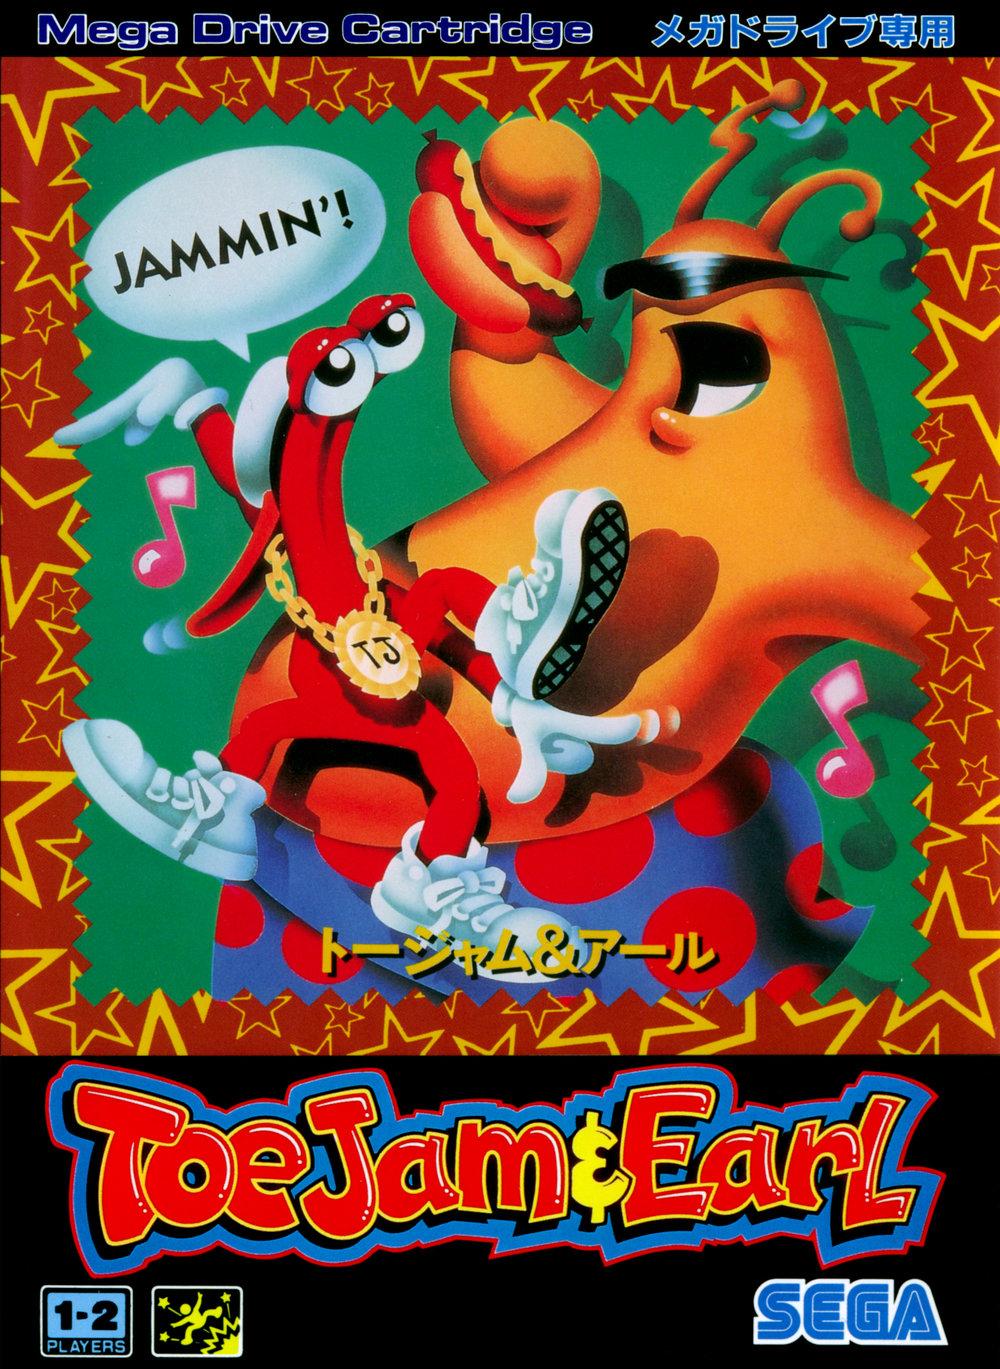 2389550 genesis toejamandearl jp - ToeJam & Earl (JVP/Sega, 1991)